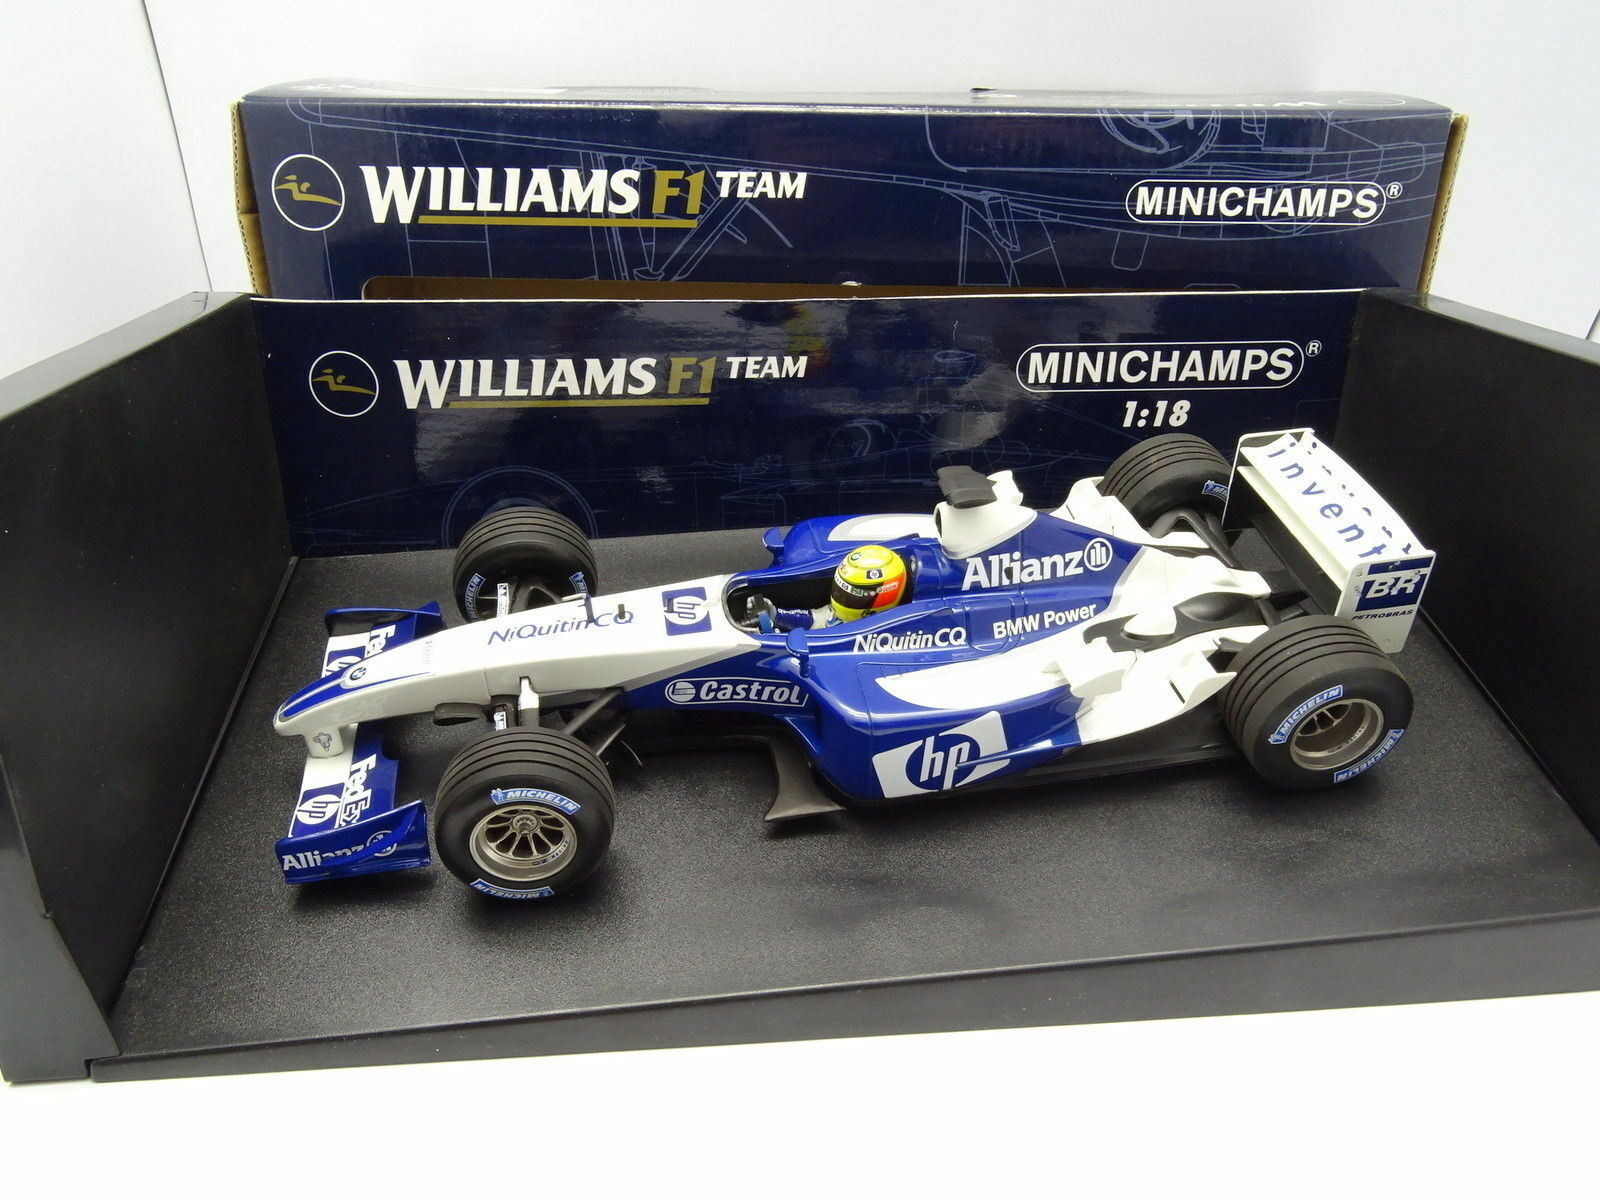 Minichamps 1 18 - F1 Williams BMW FW25 R Schumacher